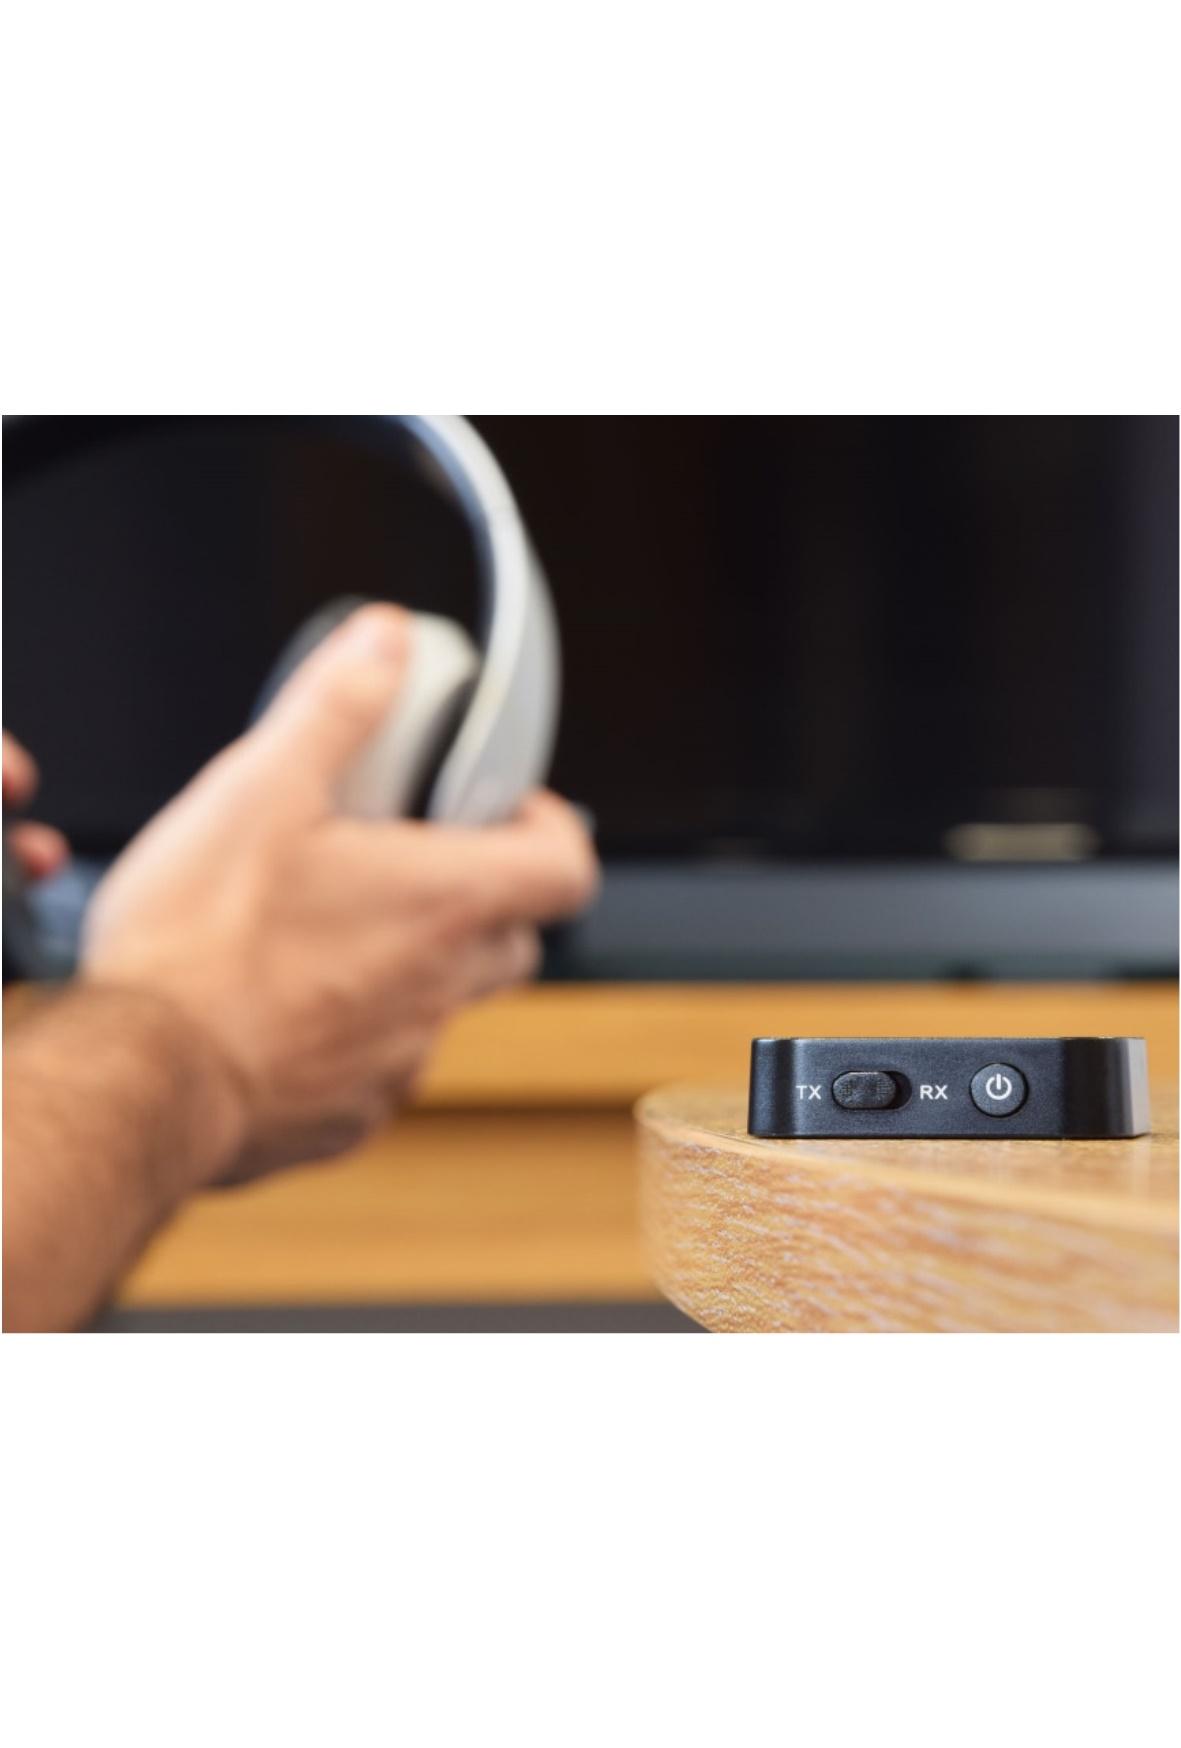 AvLink BTTR2 Πομπός και Δέκτης Ήχου Bluetooth